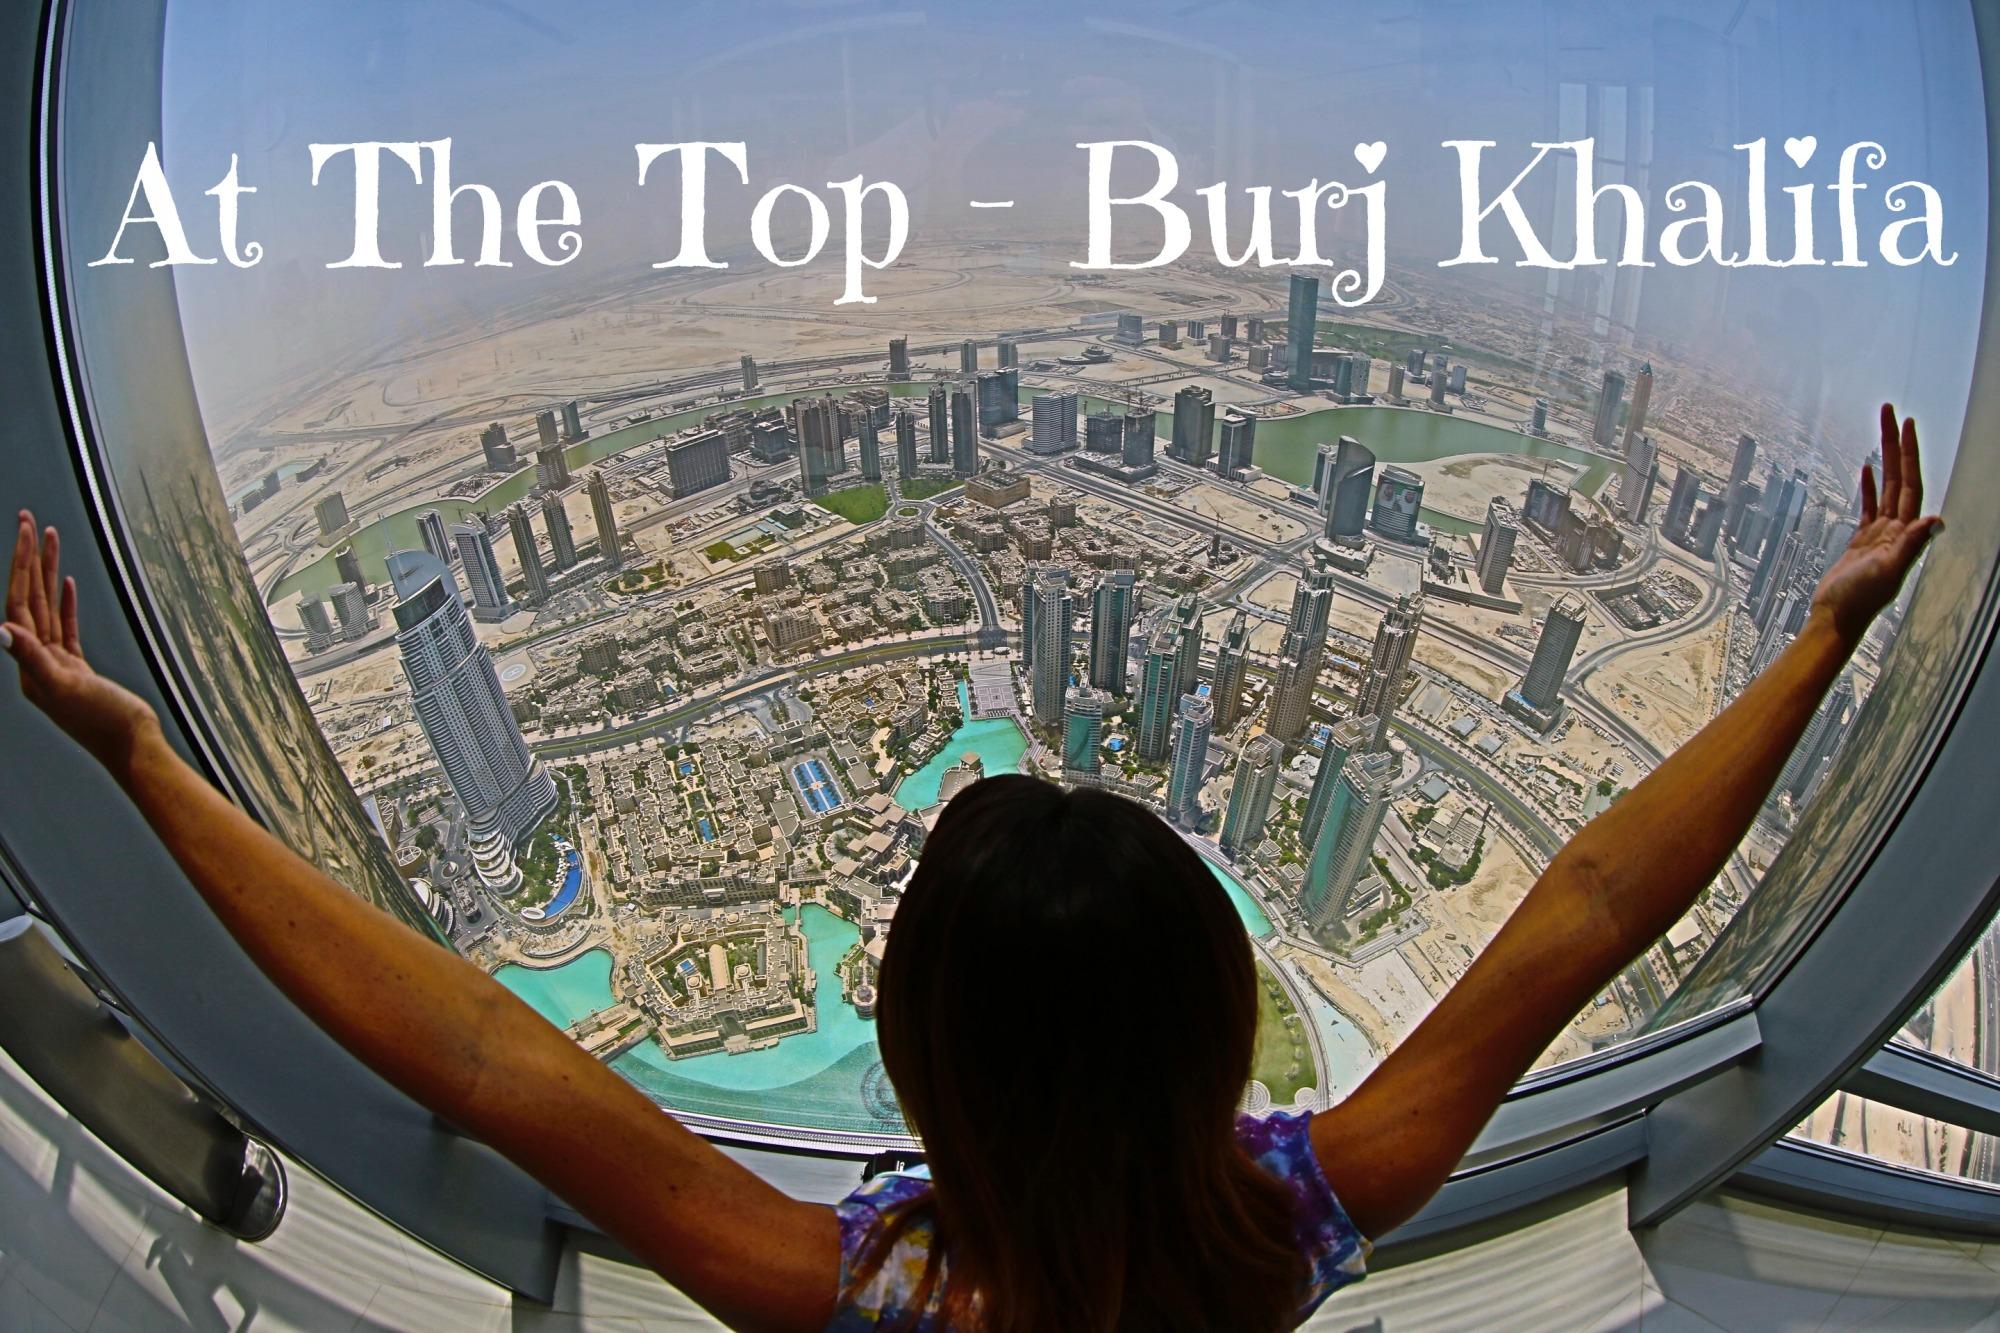 At the top - Burj Khalifa in Dubai